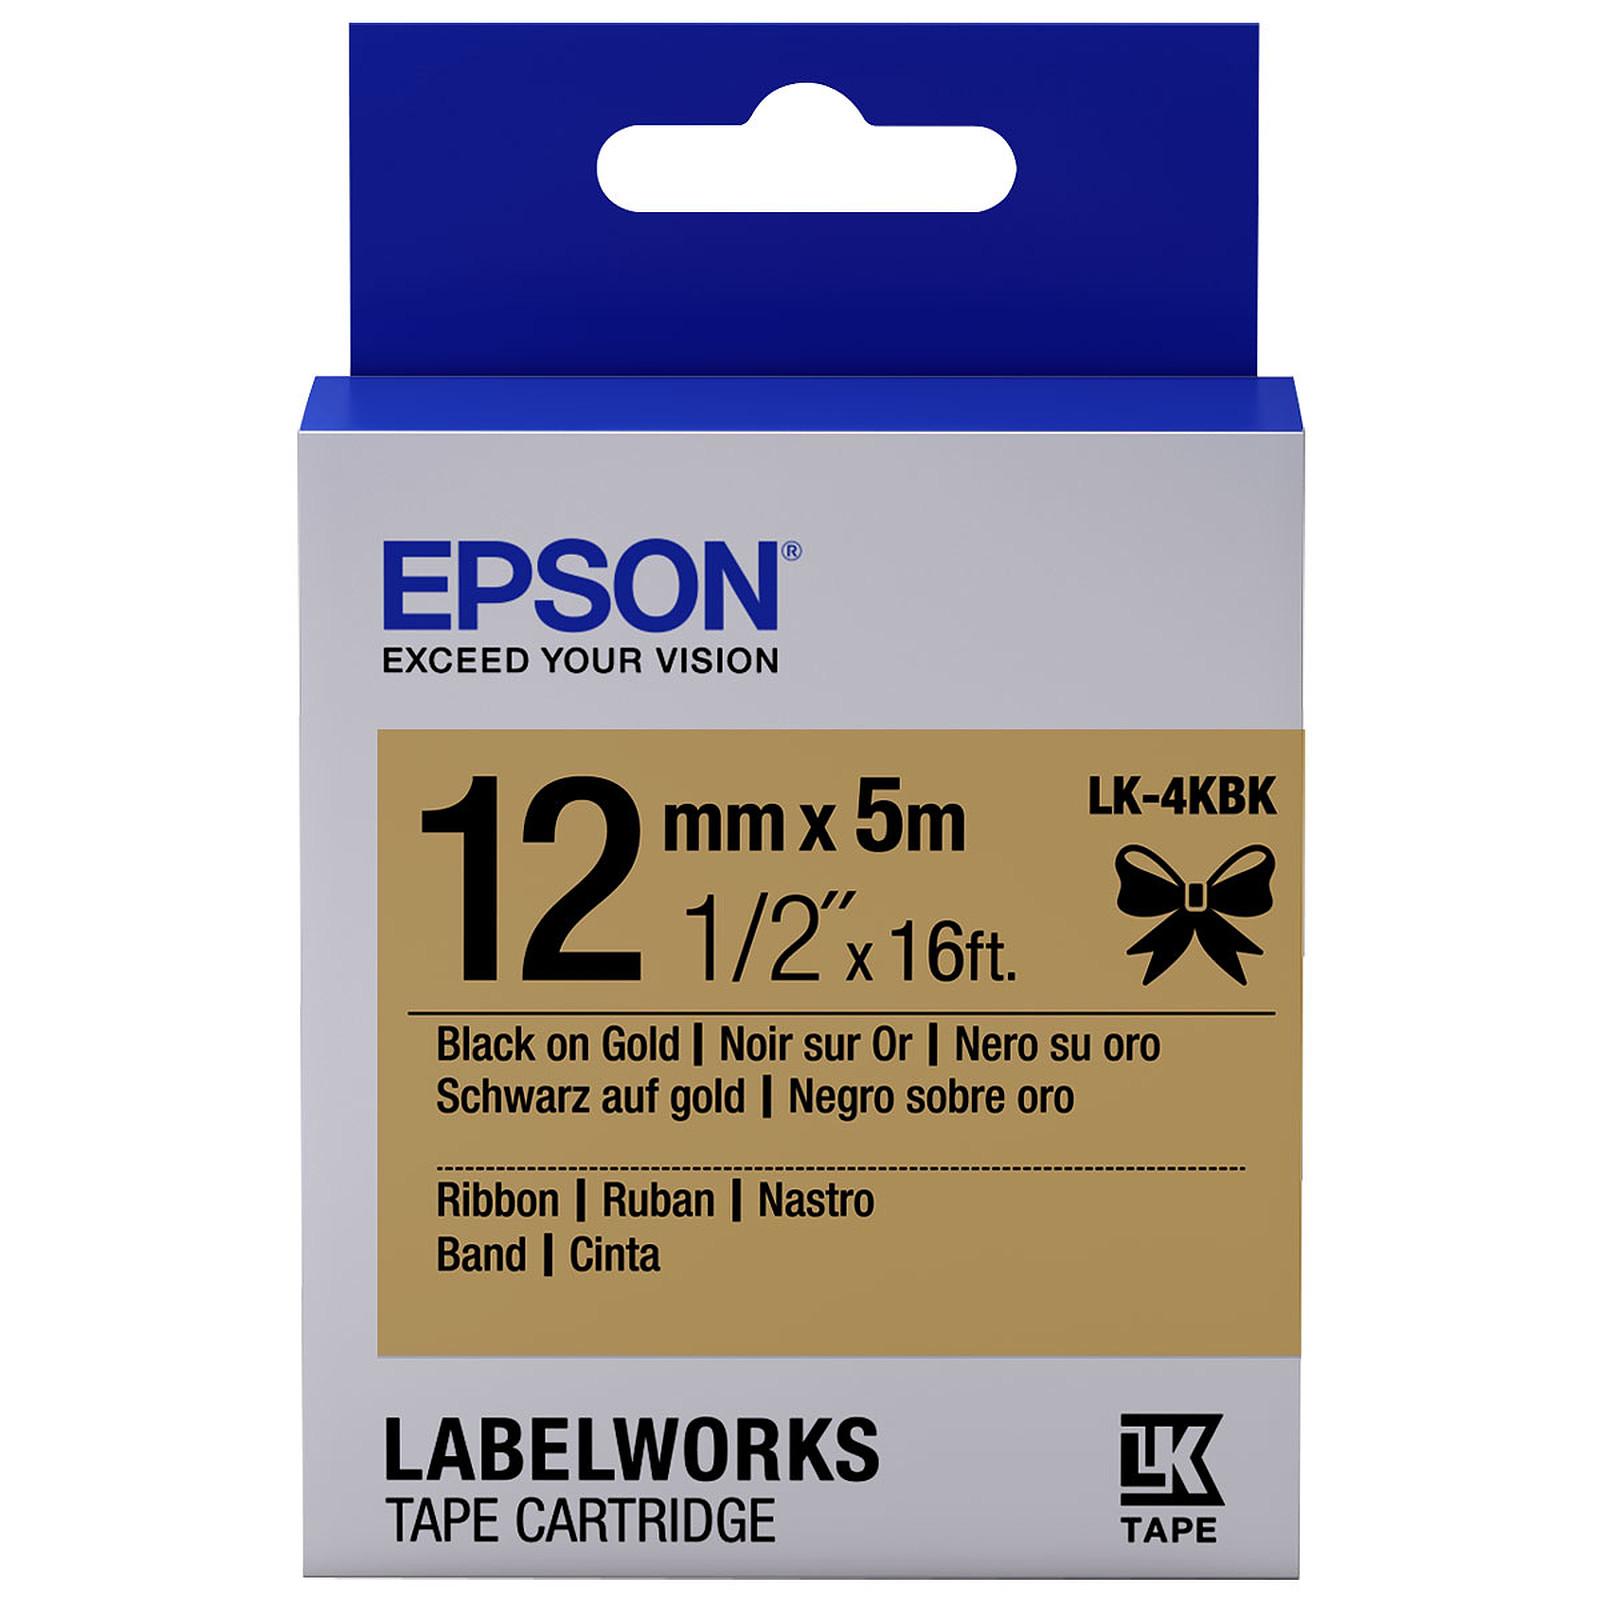 Epson LK-4KBK noir/or